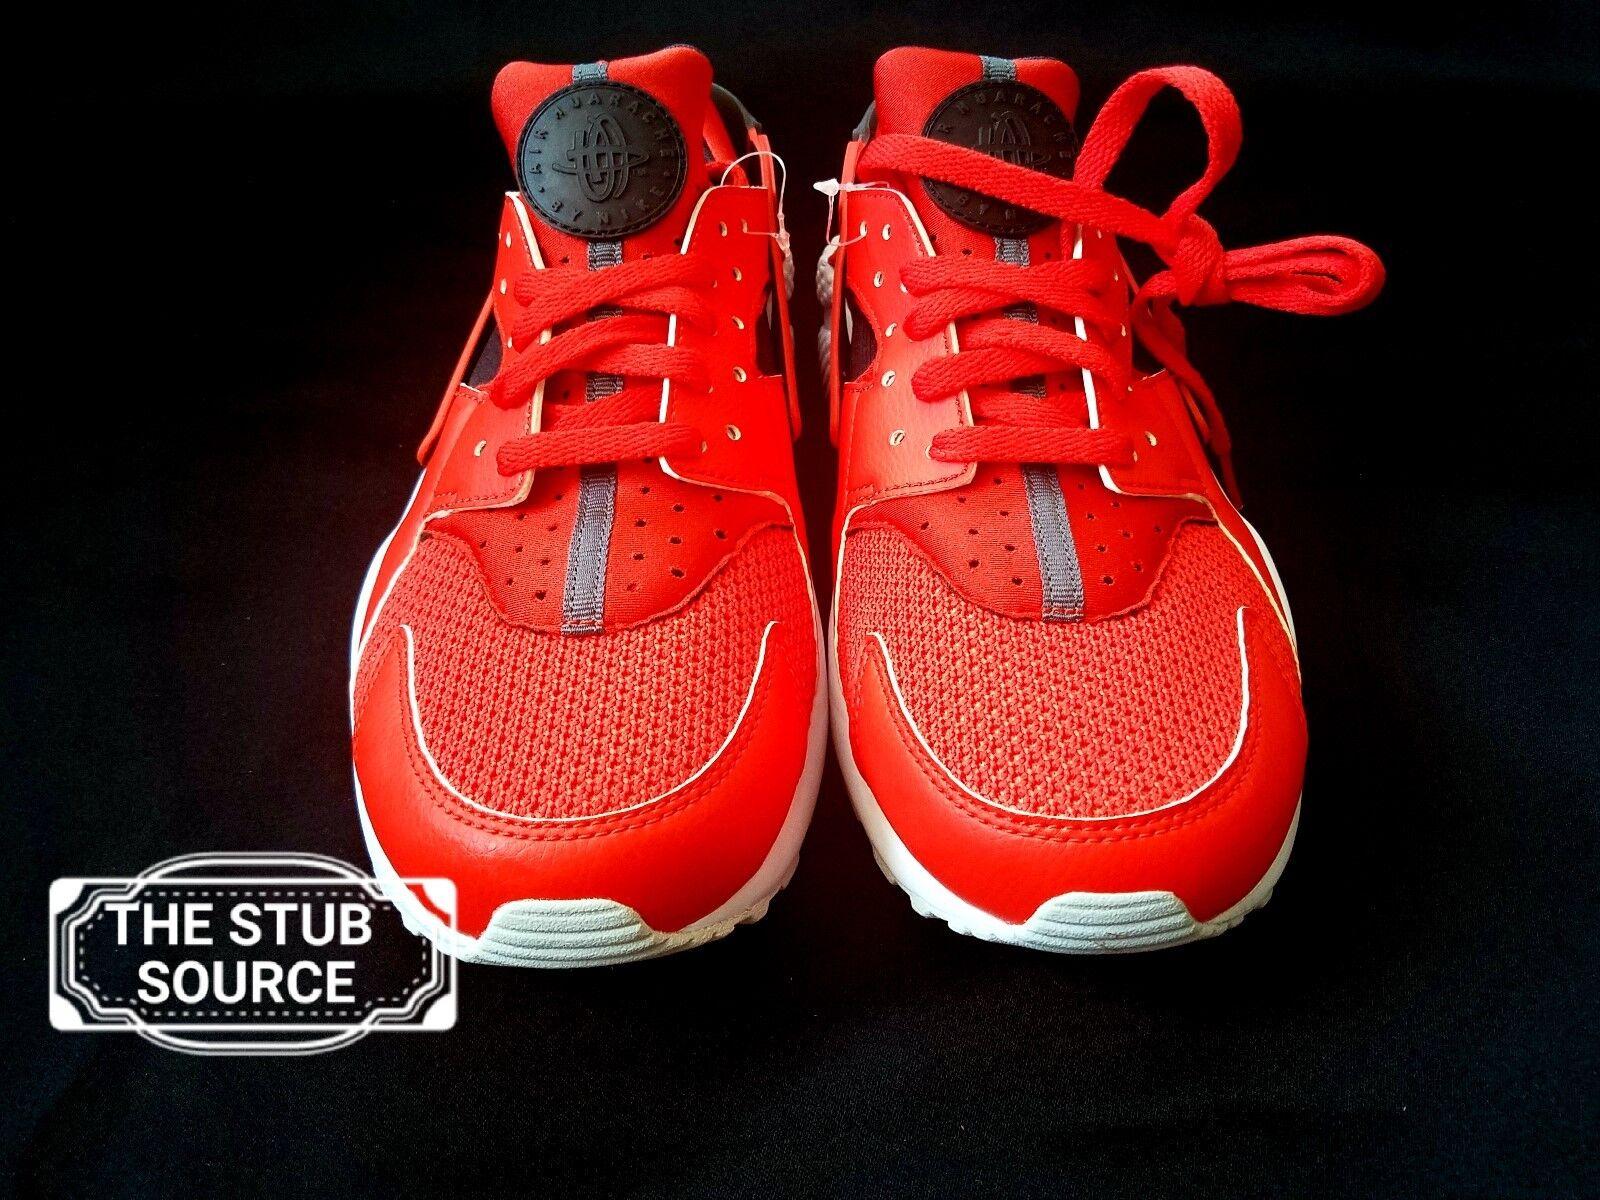 Nike Air Huarache Run Habanero Red Sample 9 Shoes Sneakers Size 9 Sample 318429-609 NWOB 6a3c9f